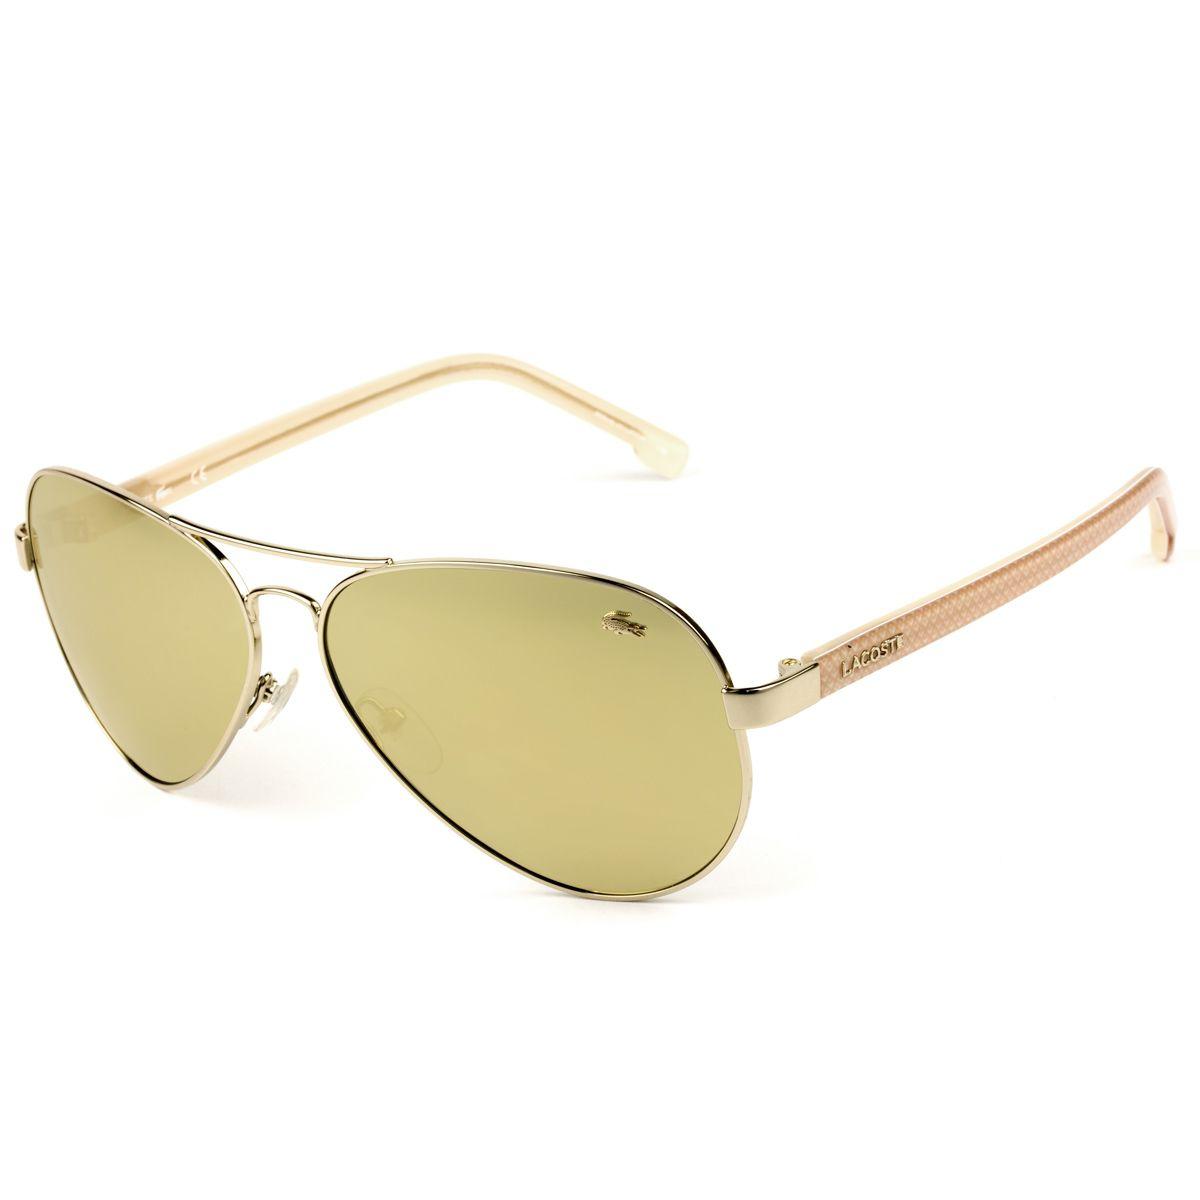 Óculos De Sol Lacoste Unissex L163S 714 - Omega Ótica e Relojoaria 4eff179bf6